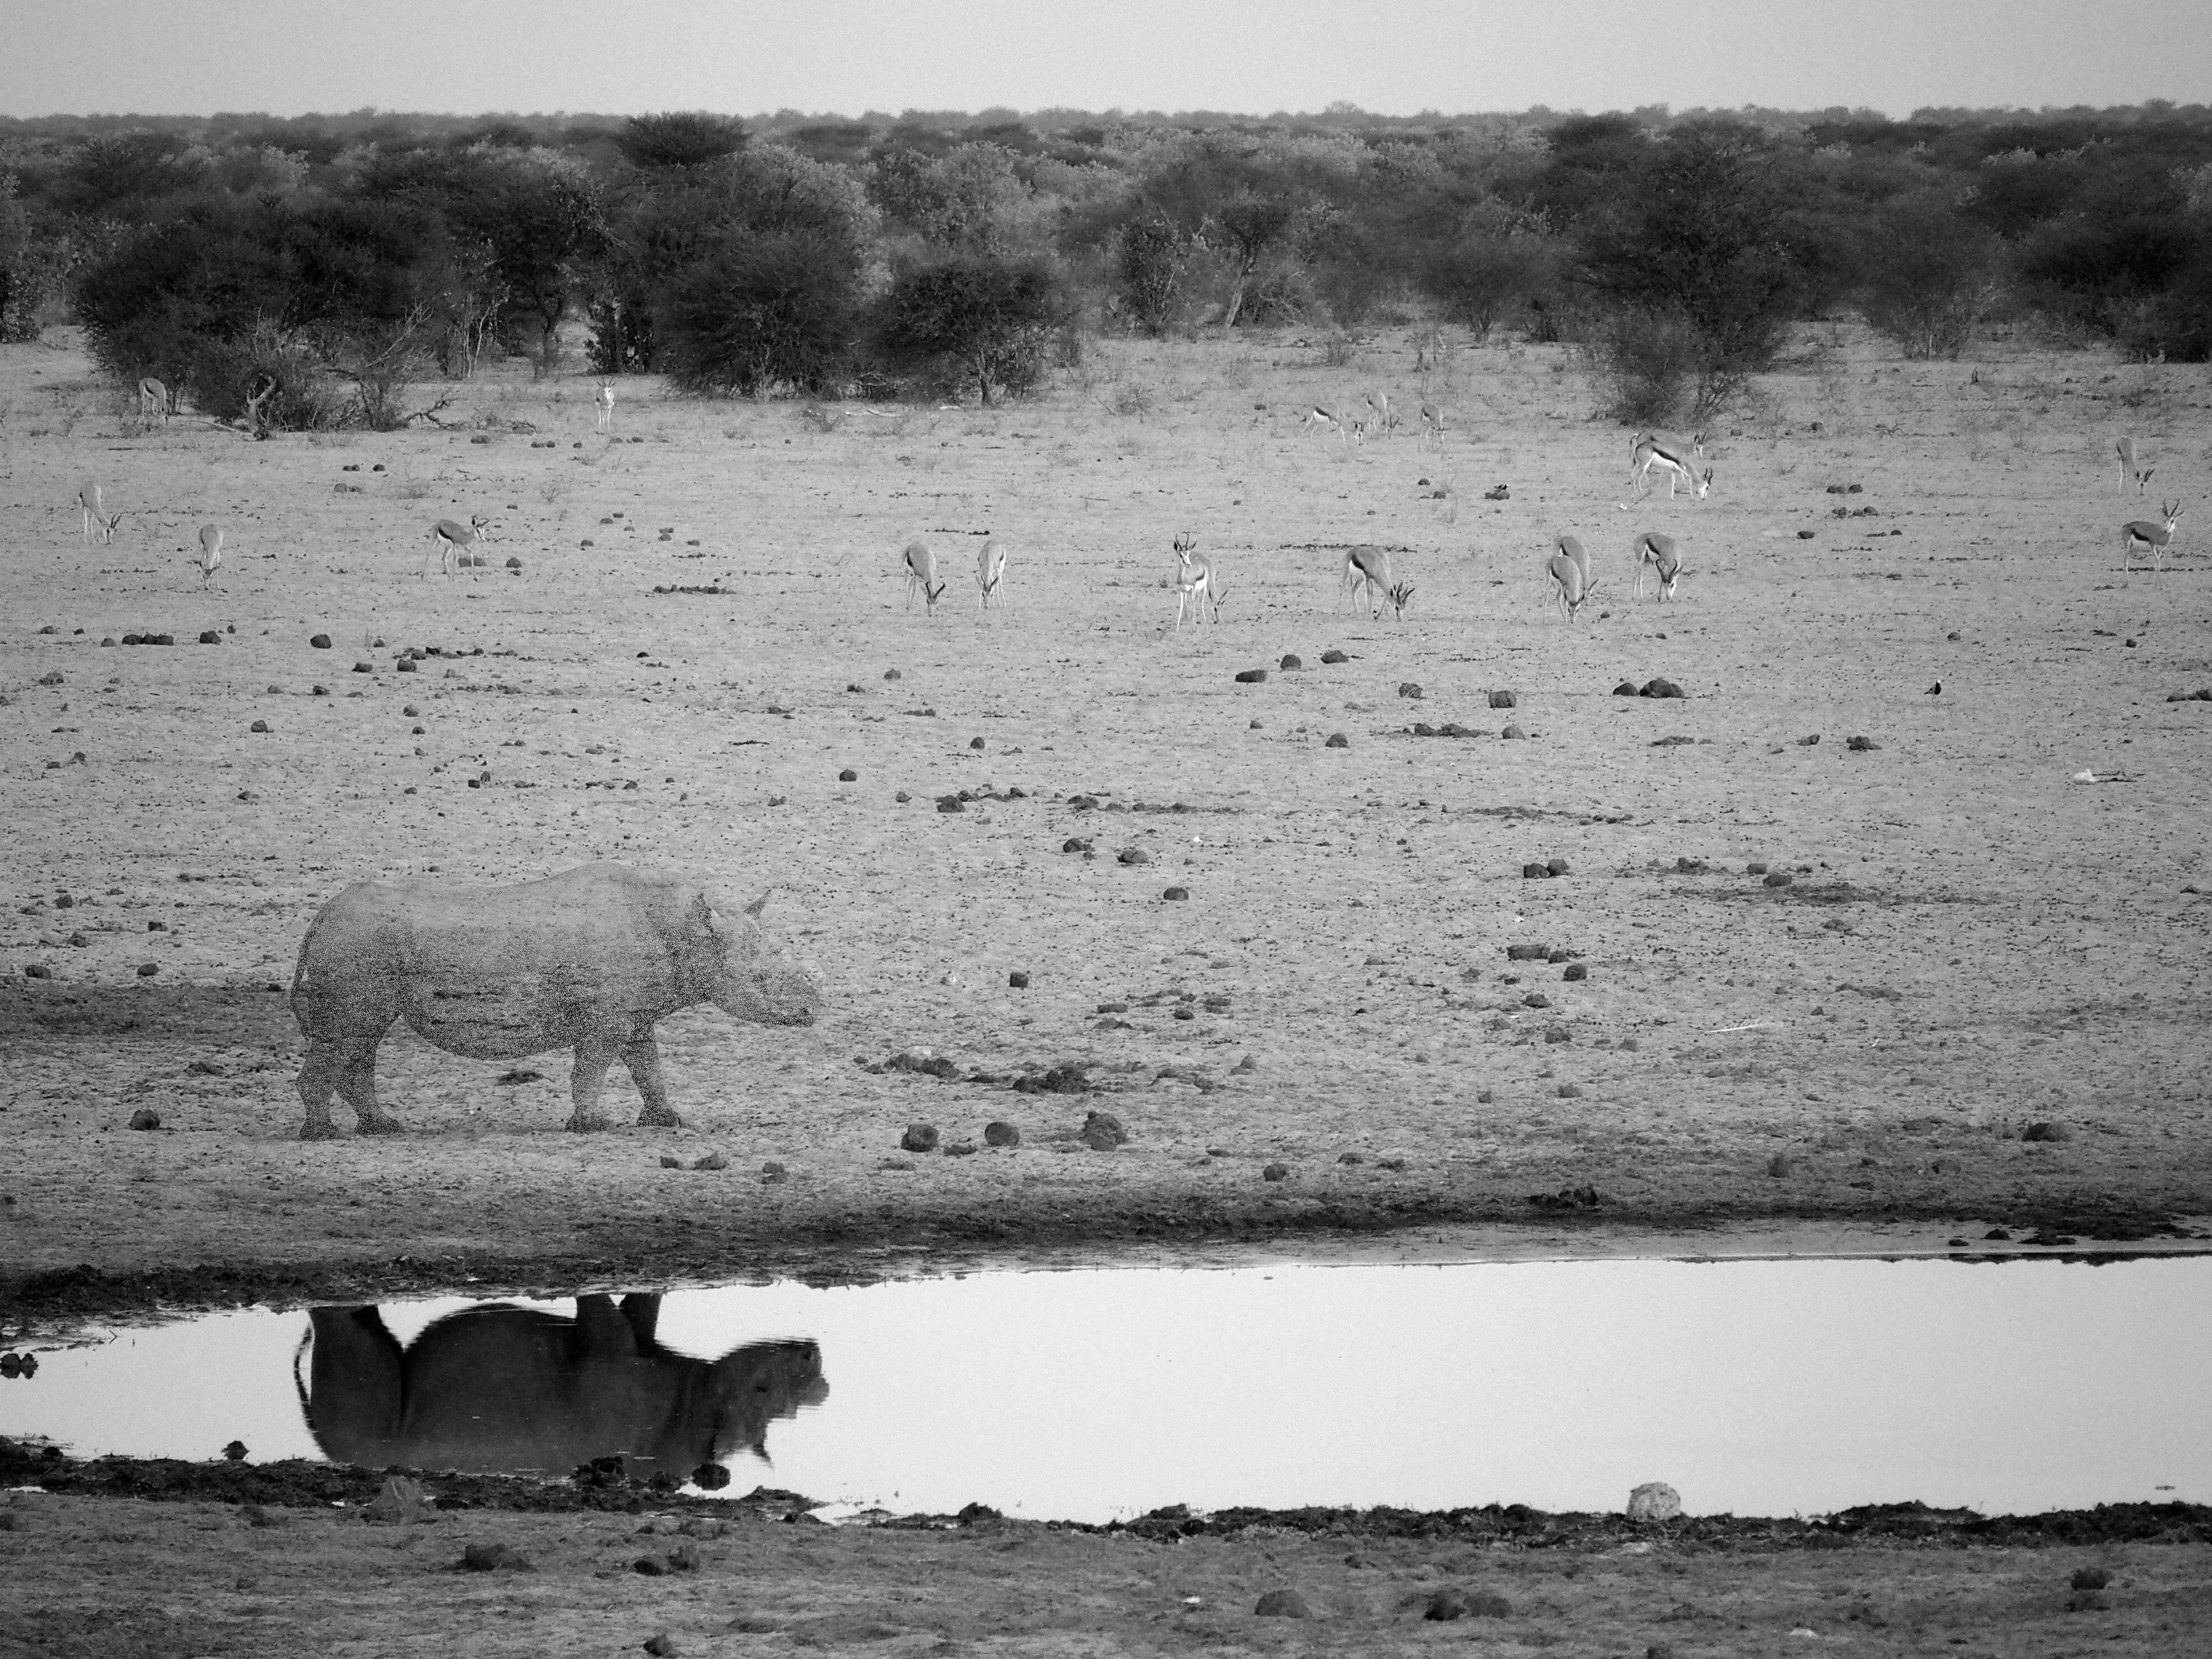 Disappearing Series (Black Rhino)